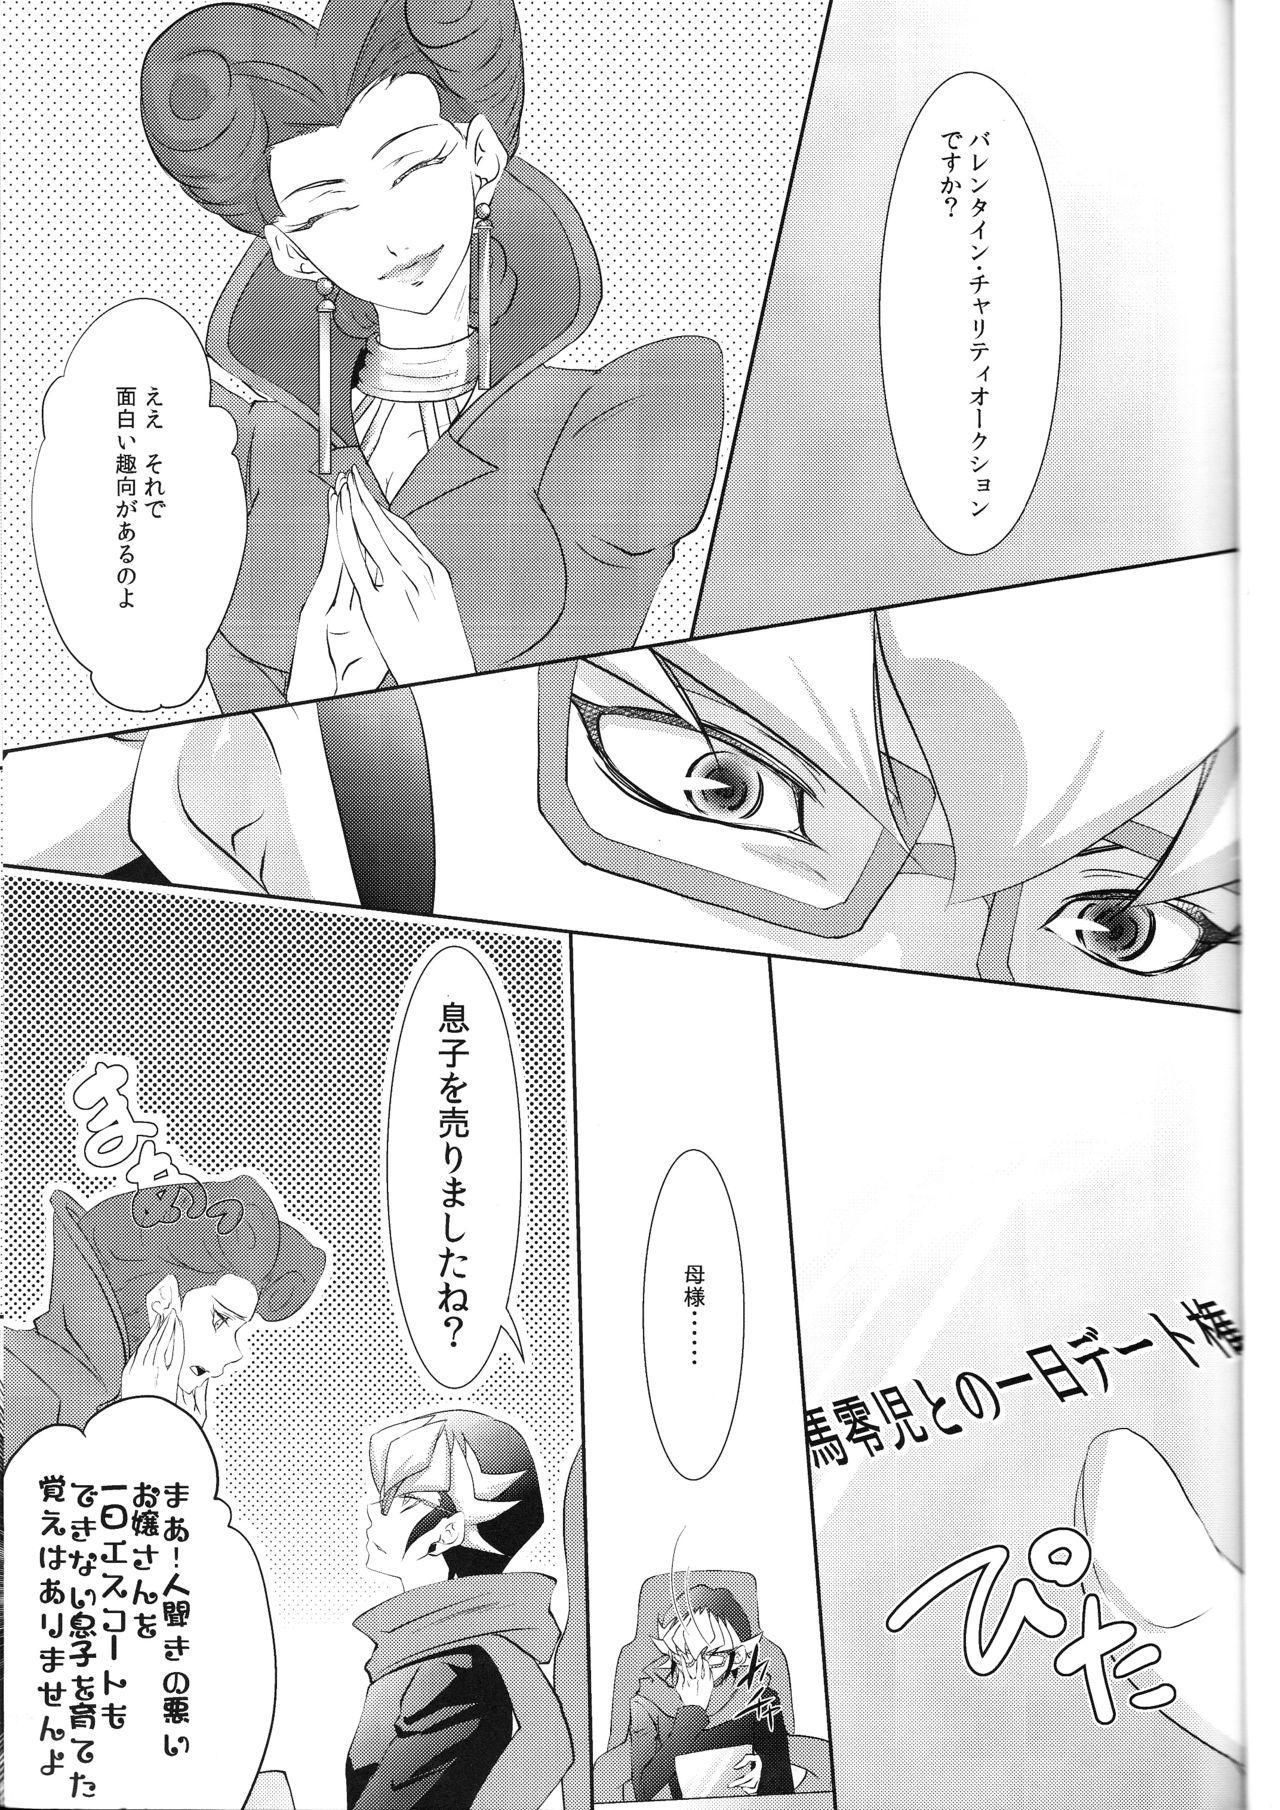 Rune Eyes 2